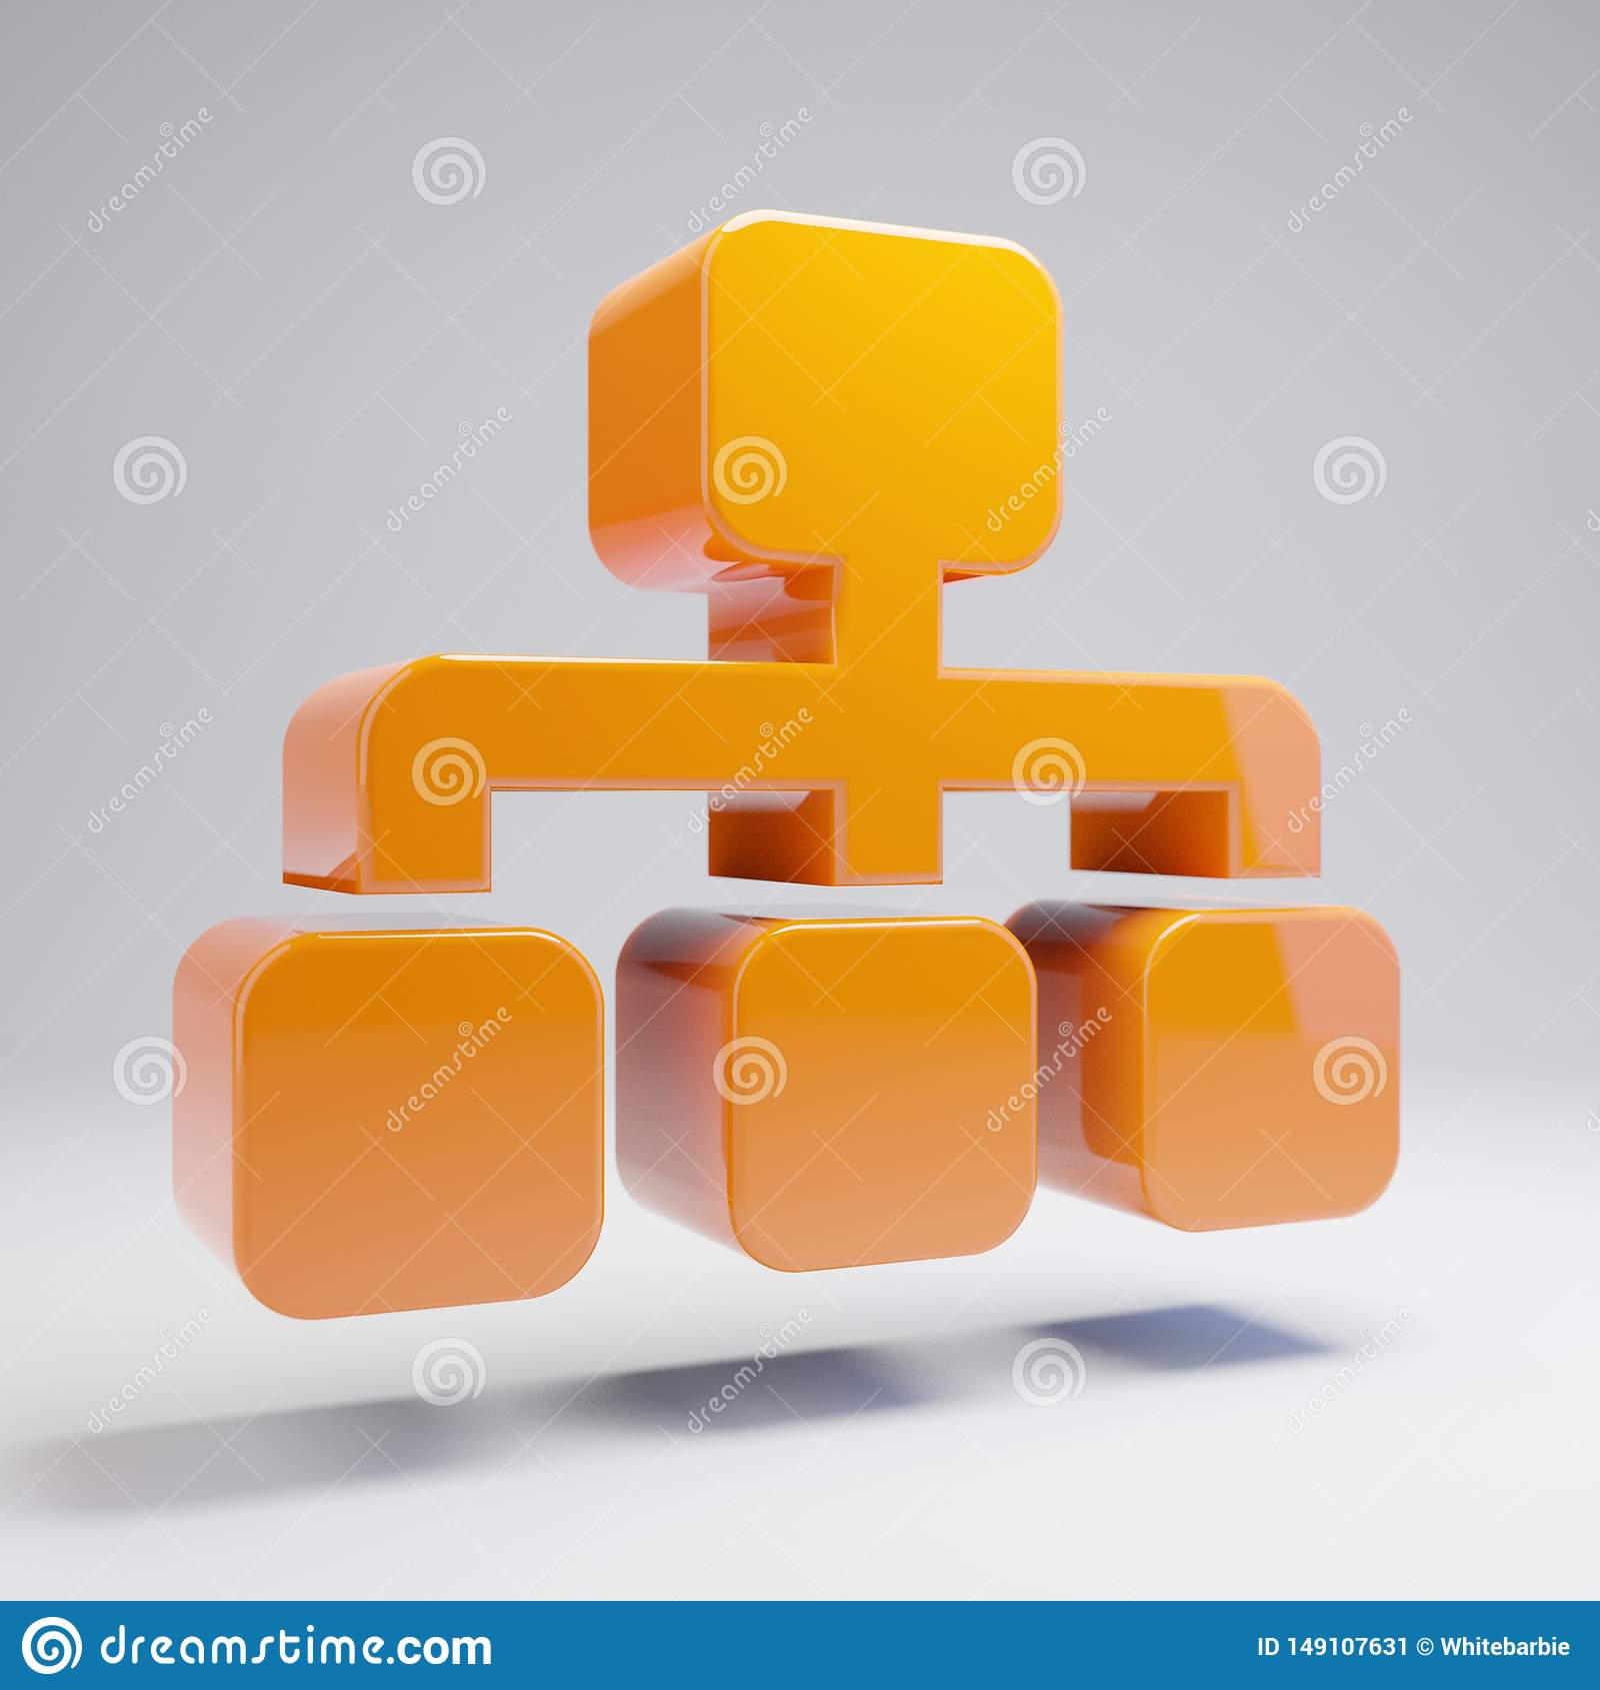 Volymetrisk glansig varm orange Sitemap symbol som isoleras på vit bakgrund